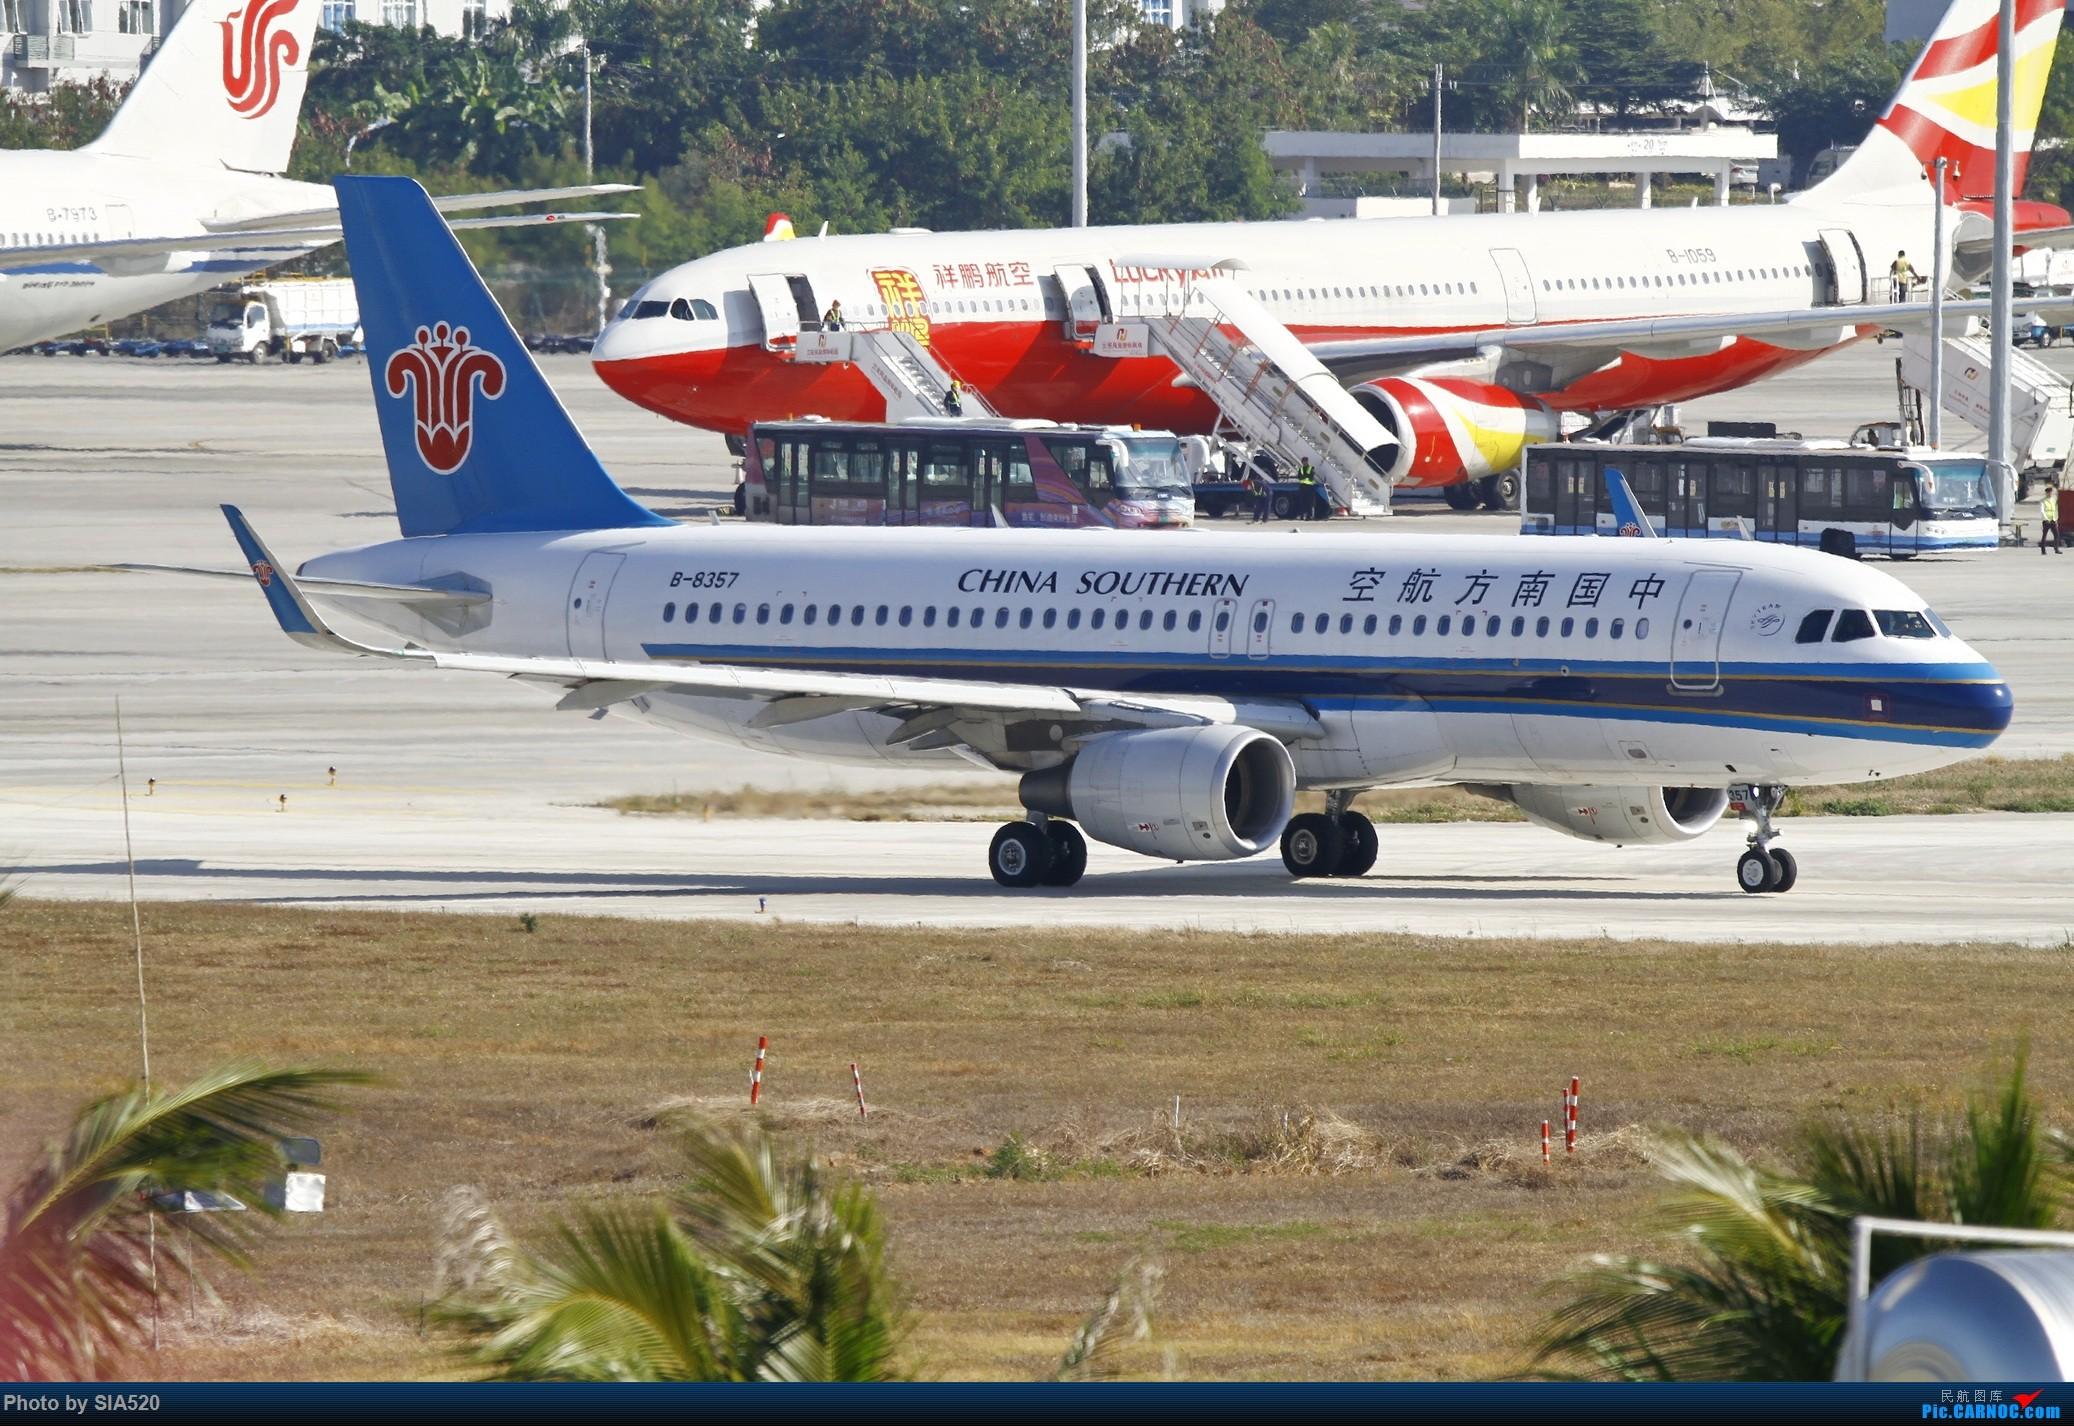 Re:[原创]北京人儿在三亚—600mm解锁凤凰 AIRBUS A320-200 B-8357 中国三亚凤凰国际机场